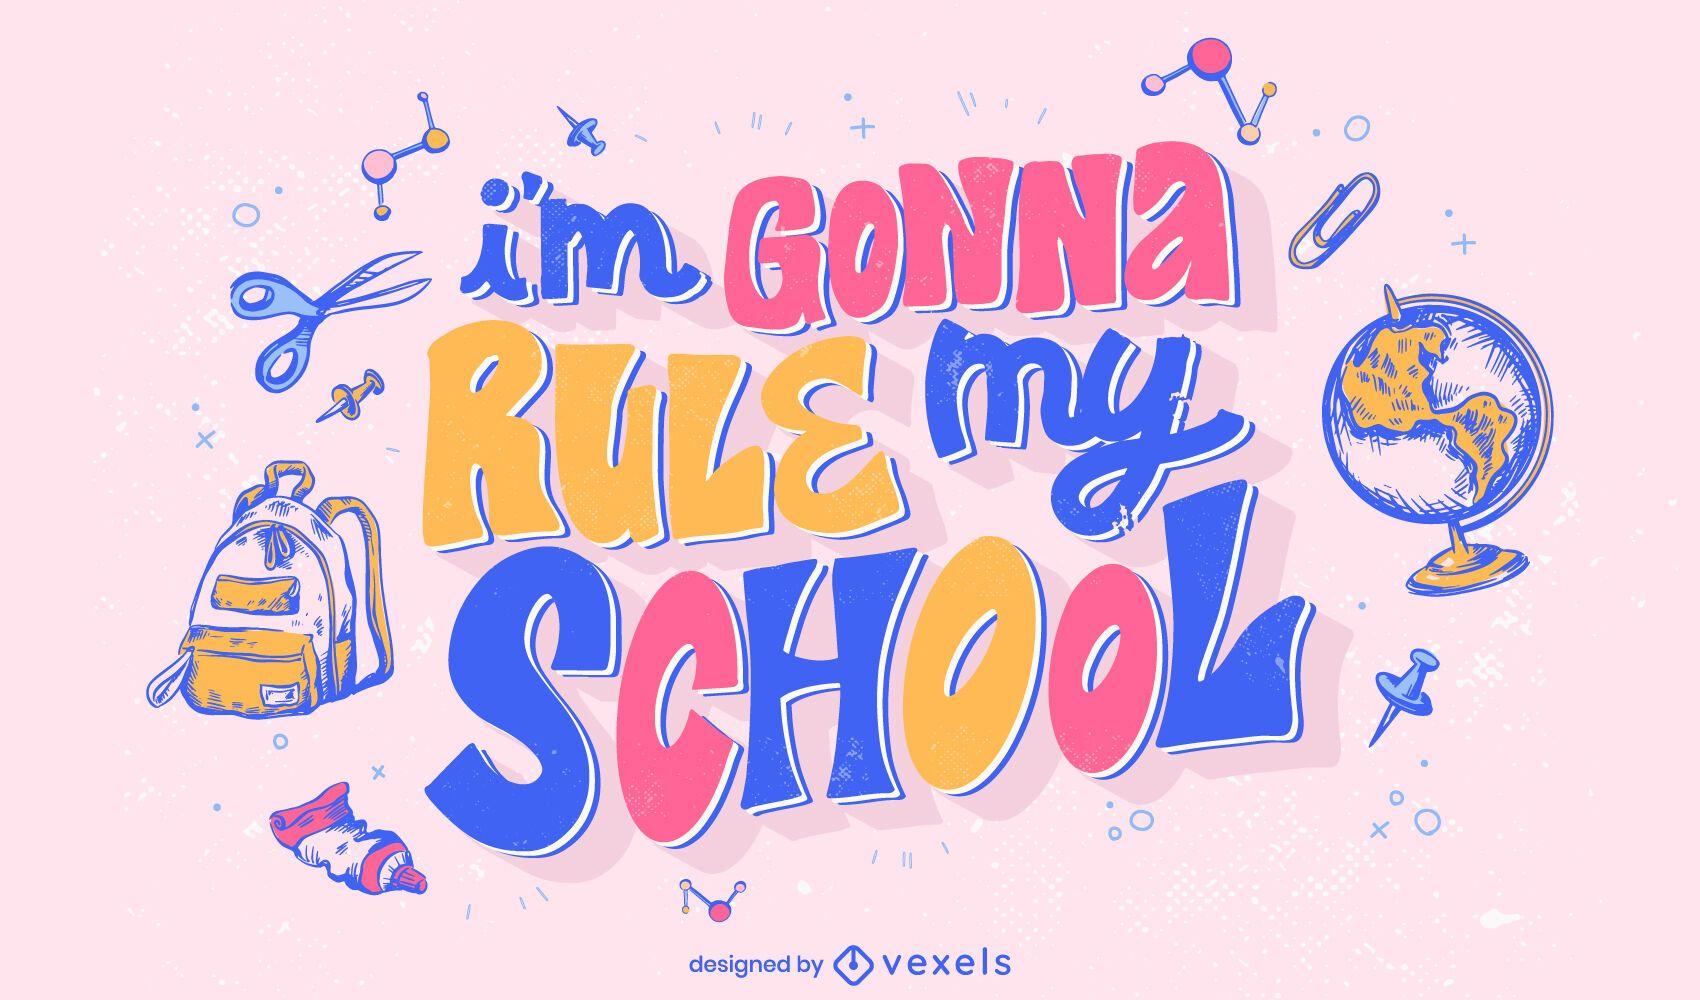 School quote colorful lettering design